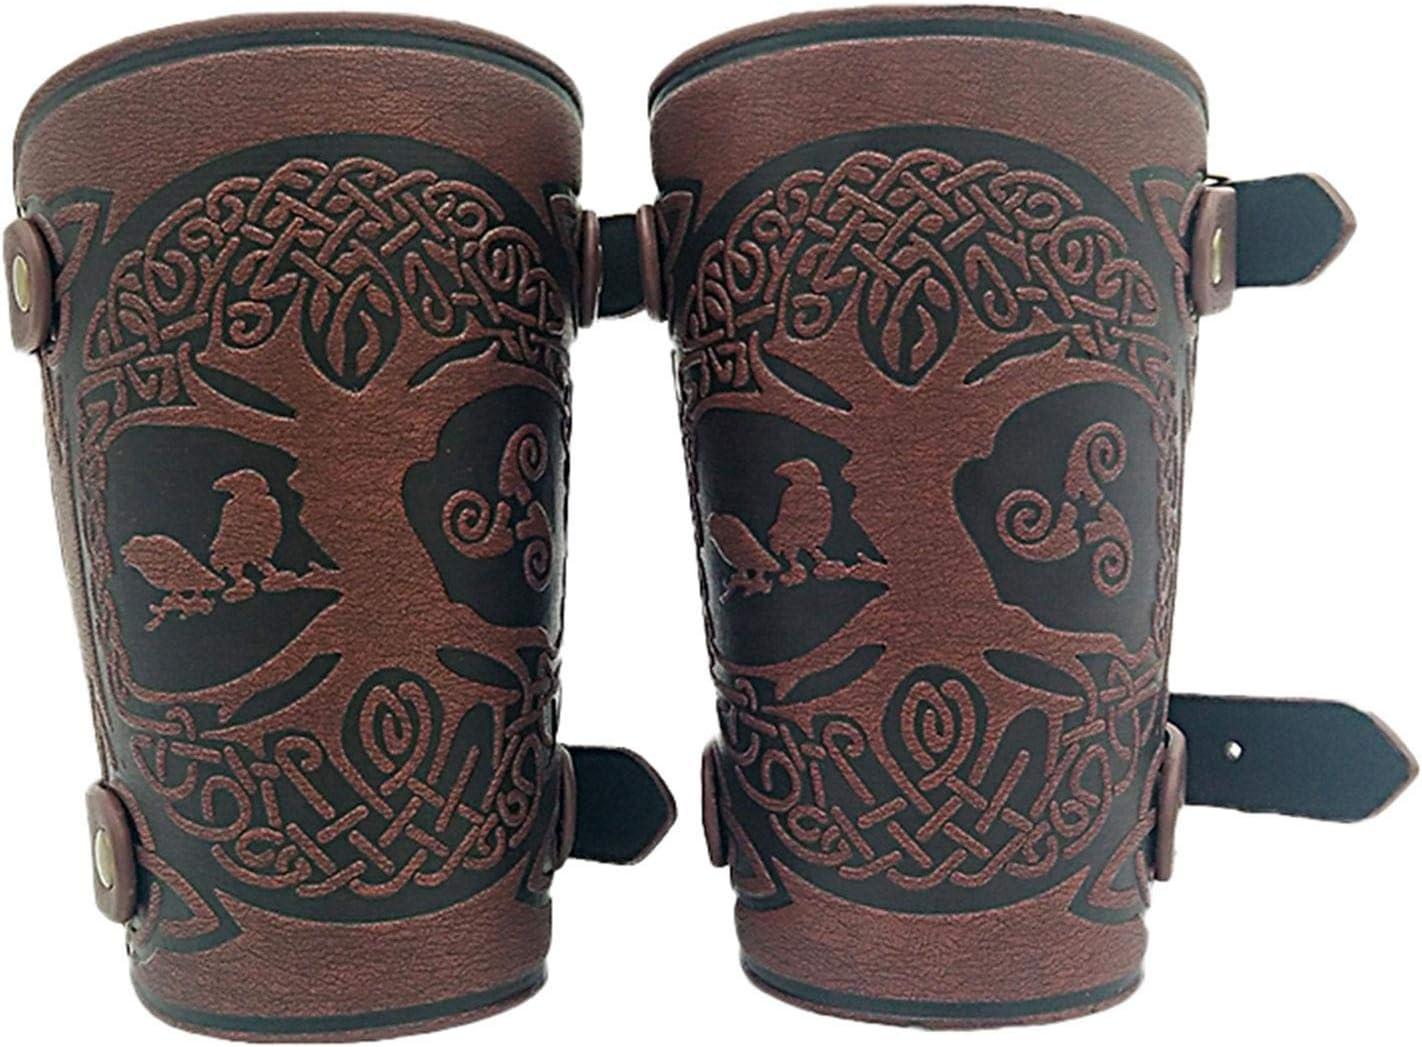 Protector de brazo de tiro con arco, protectores de antebrazo, manga de disparo, cuero ajustable completo del antebrazo, muñequera de cuero unisex (1 par)